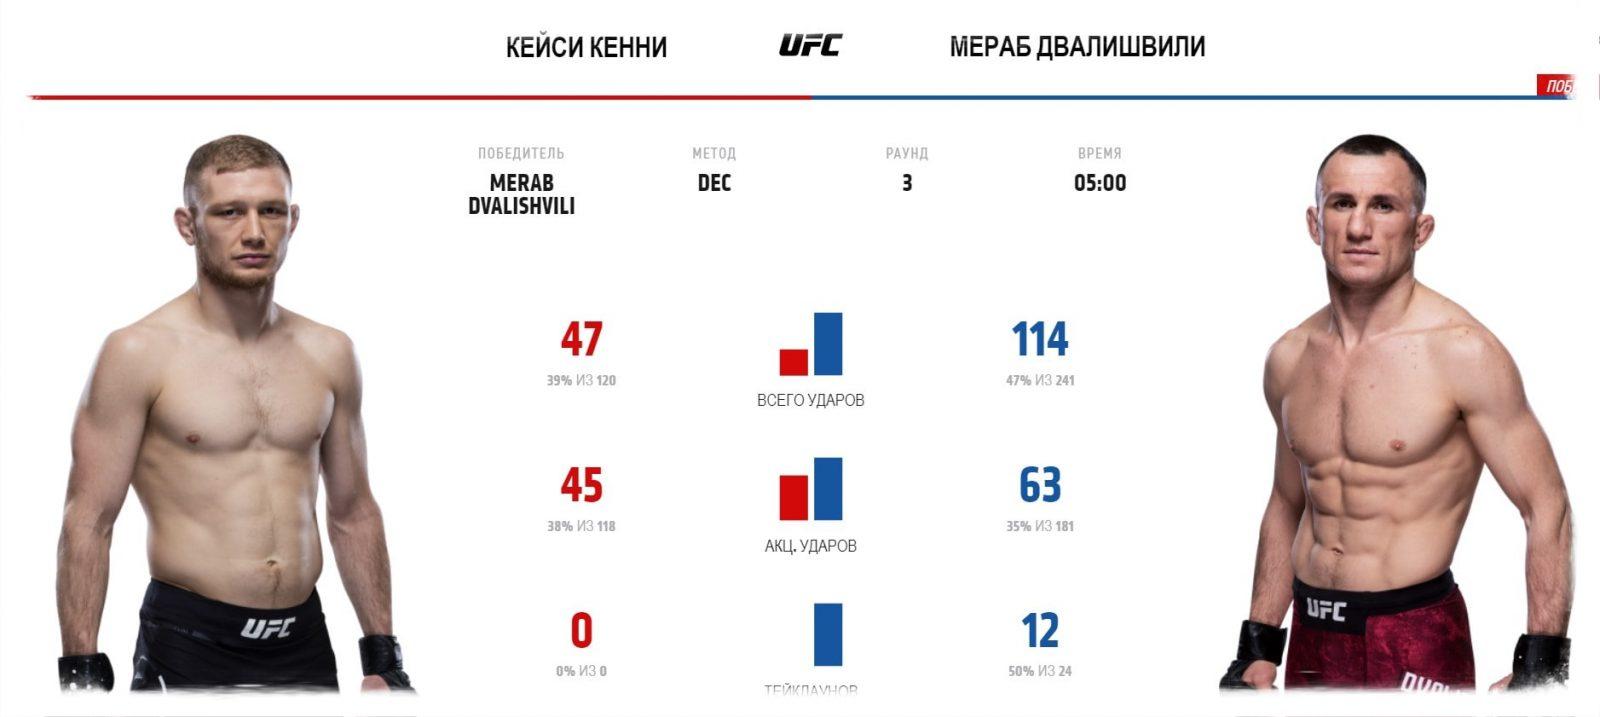 video-boya-merab-dvalishvili-kejsi-kenni-merab-dvalishvili-casey-kenney-ufc-fight-night-167